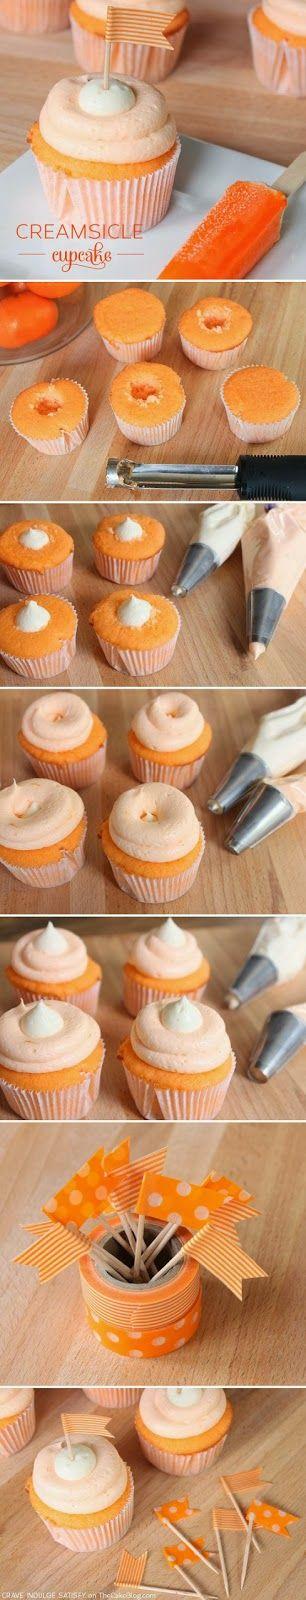 Creamsicle Cupcake Recipe